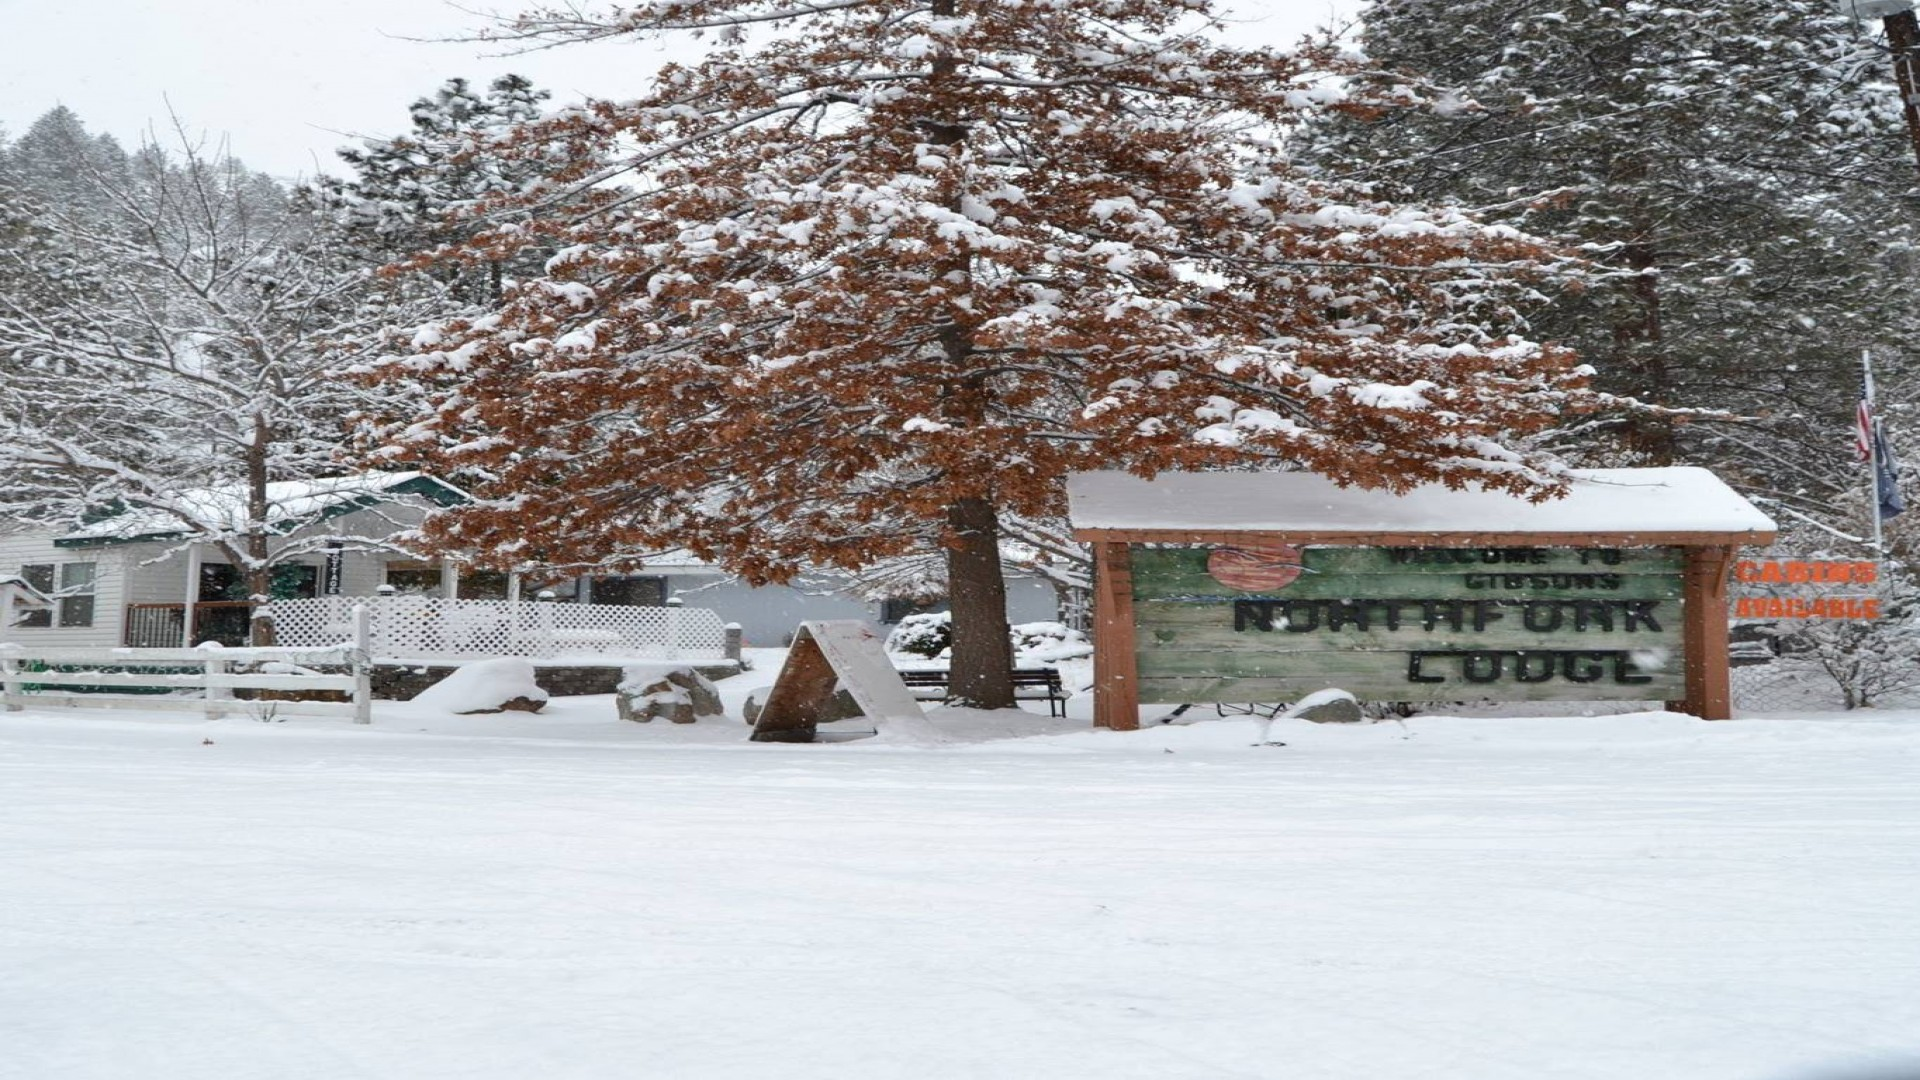 Gibson's Northfork Lodge